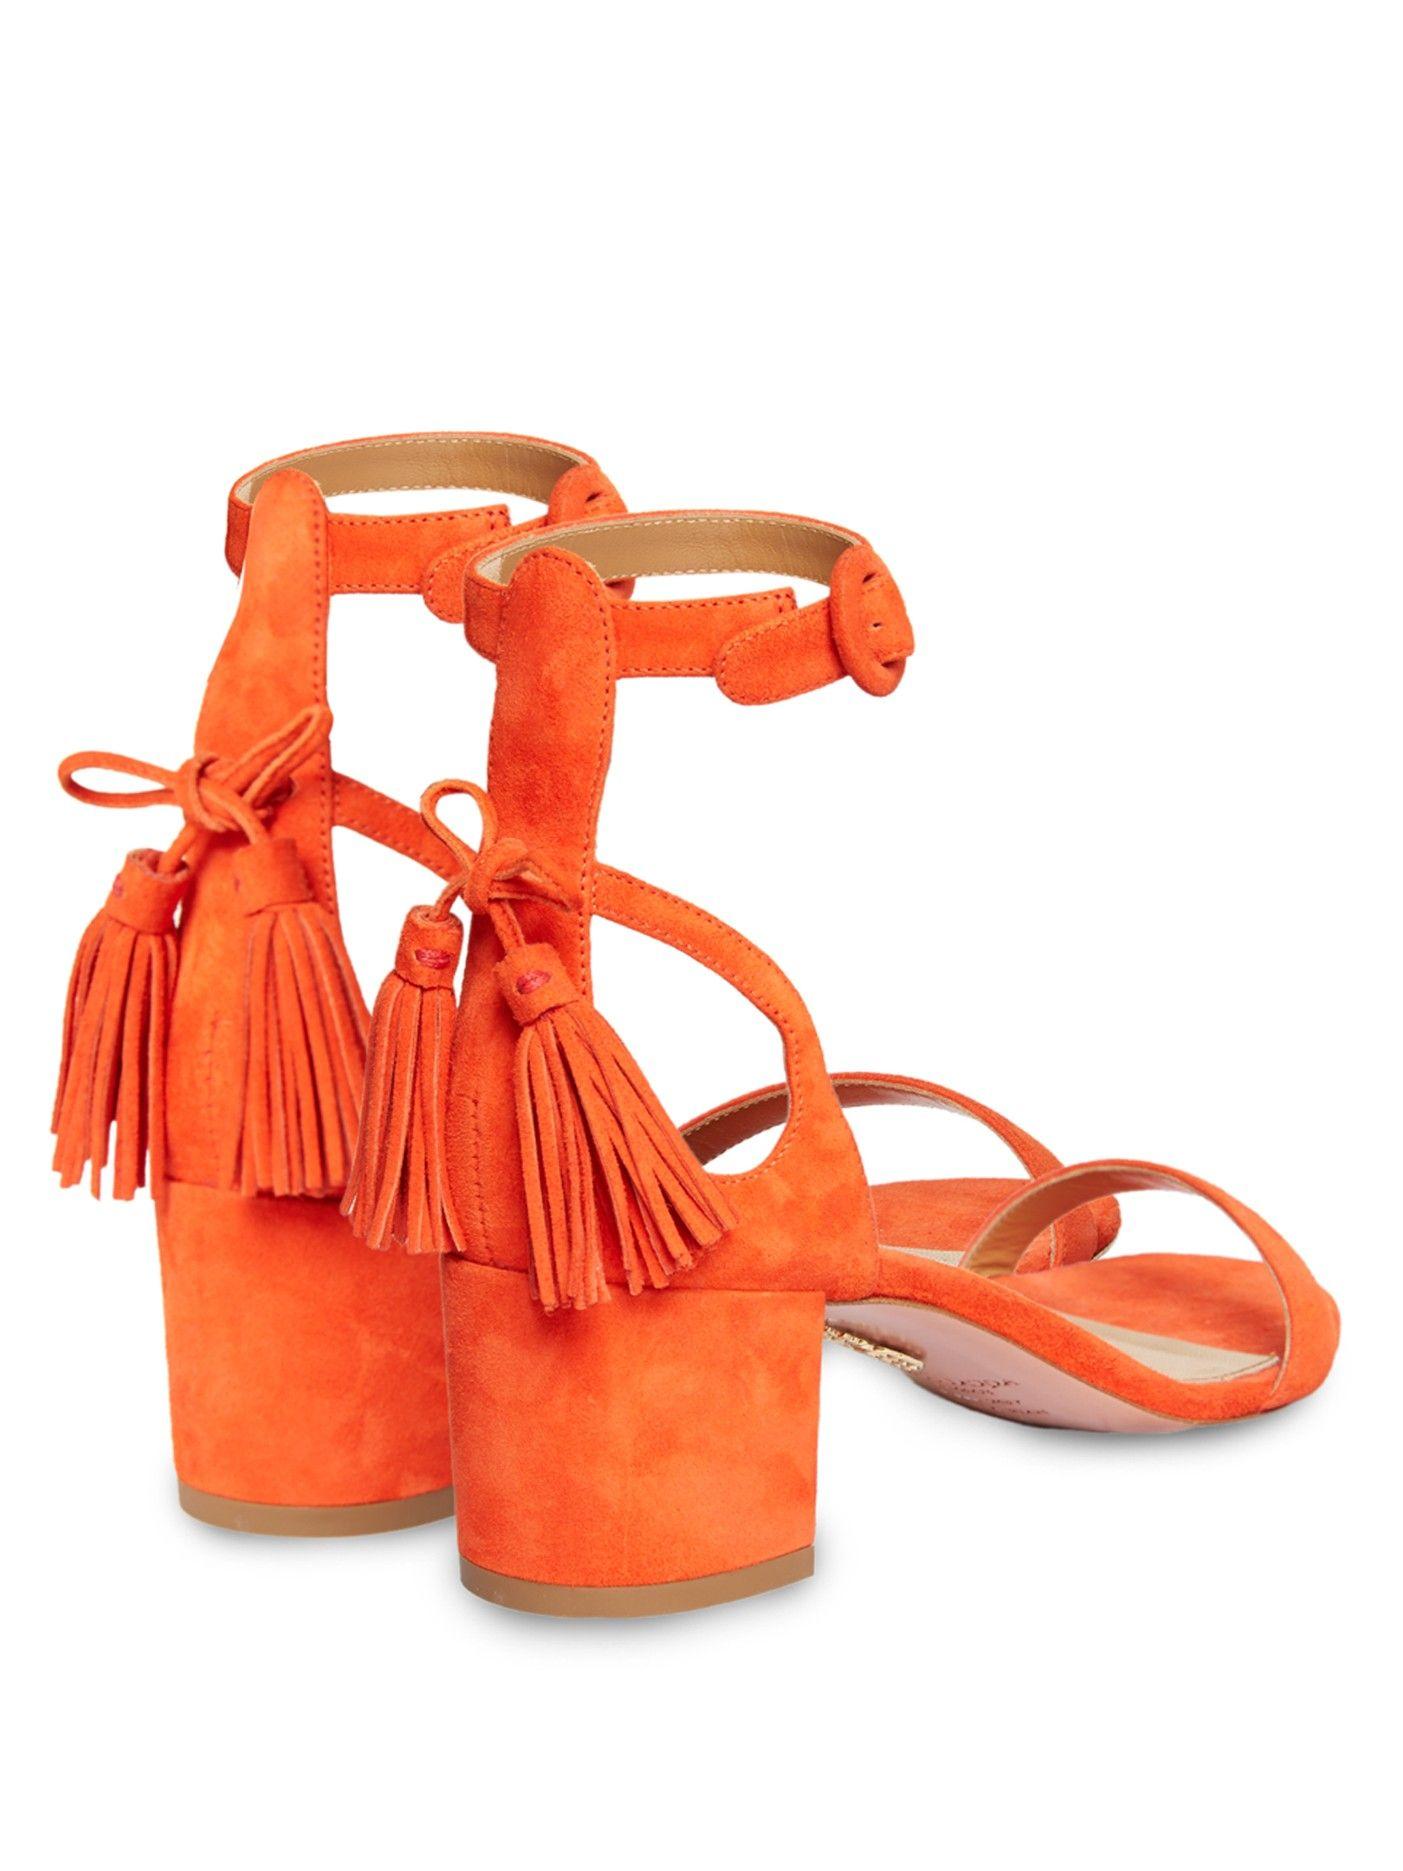 Pixie tassel-back suede sandals   Aquazzura   MATCHESFASHION.COM